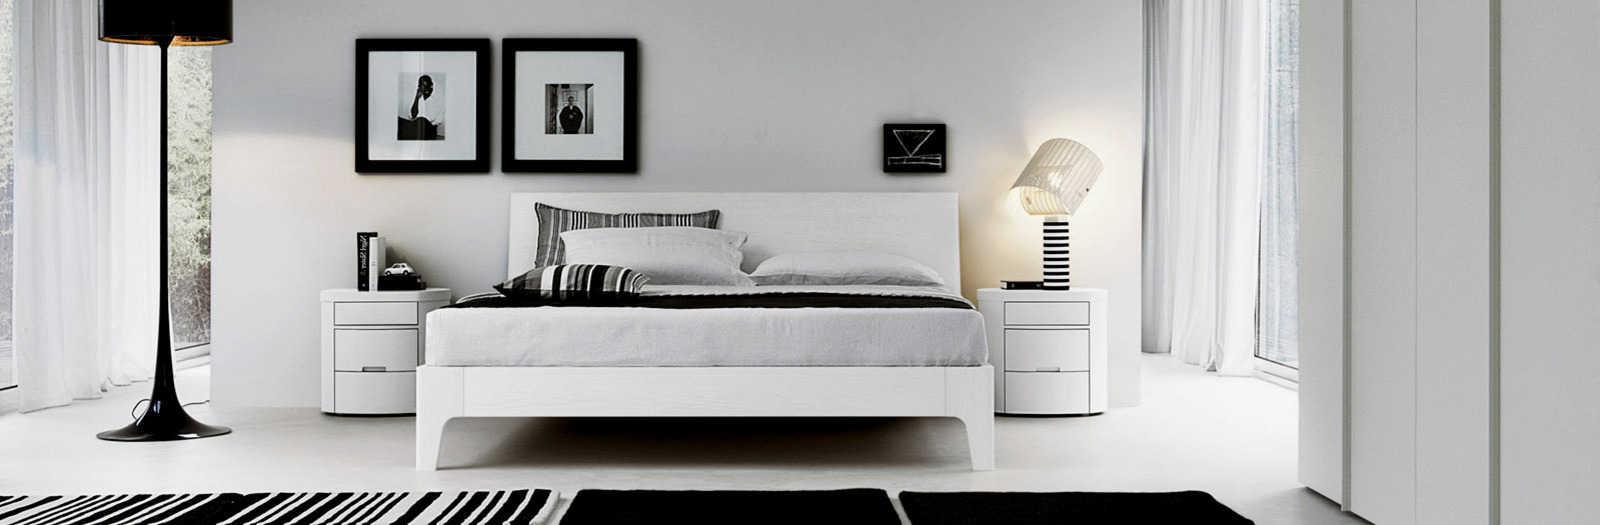 camere-stile-moderno-5